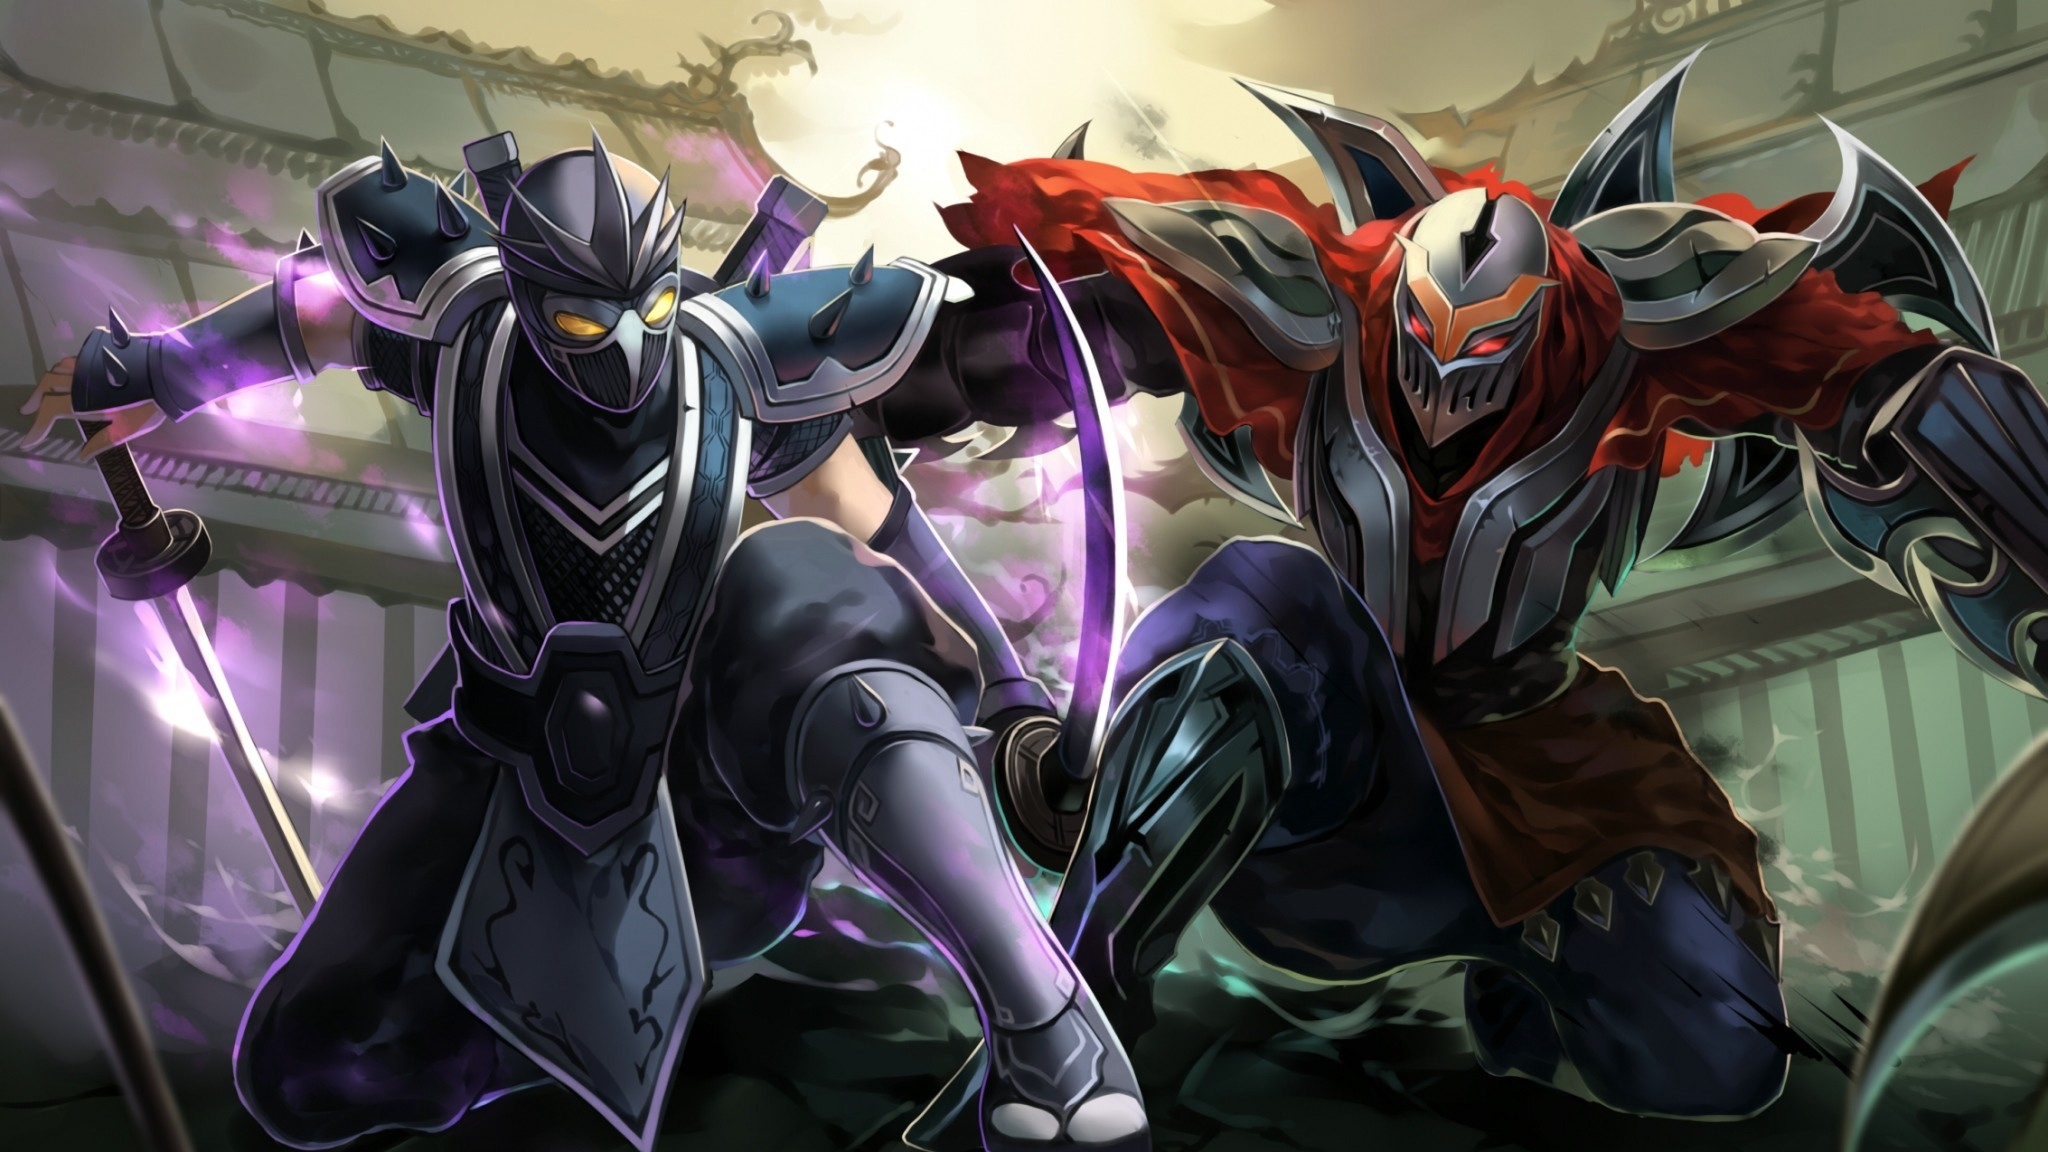 Preview wallpaper league of legends, battle, fantasy, arena, legend, magic,